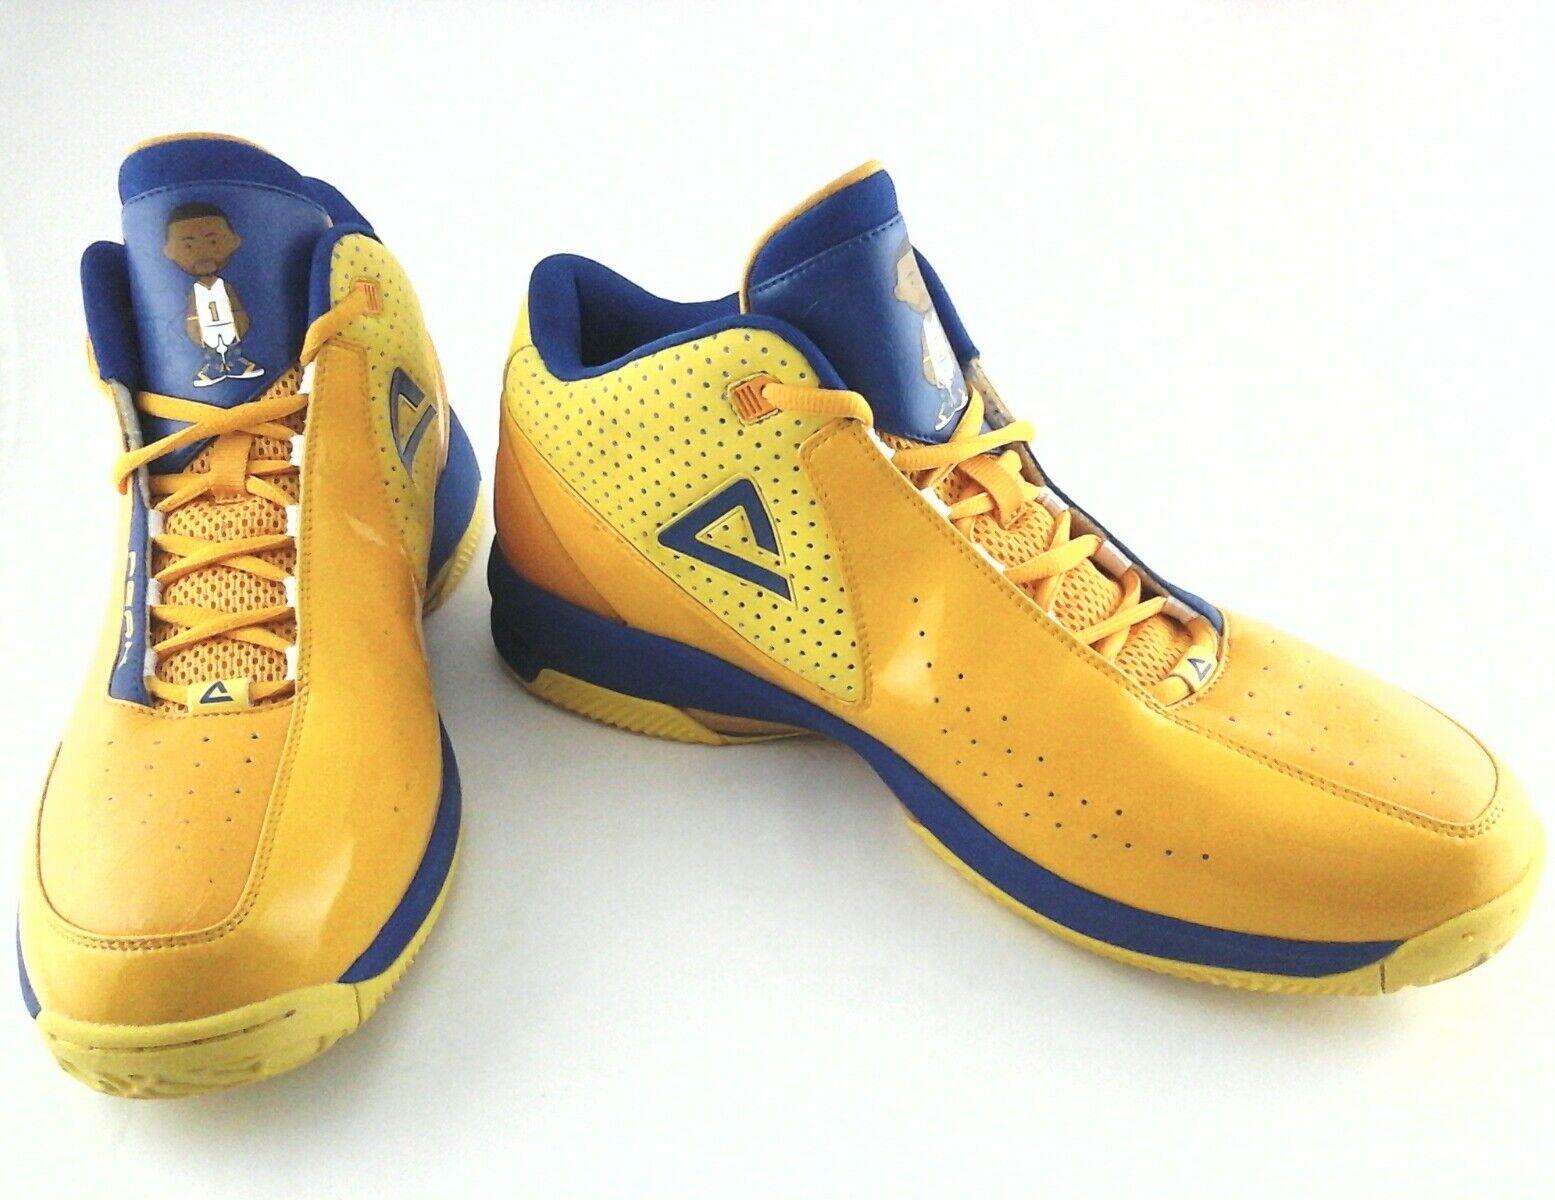 Peak DW Mens Basketball Basketball Basketball NBA Turnschuhe schuhe Lakers Farbes Gelb Blau Ultra Rare f2ba45